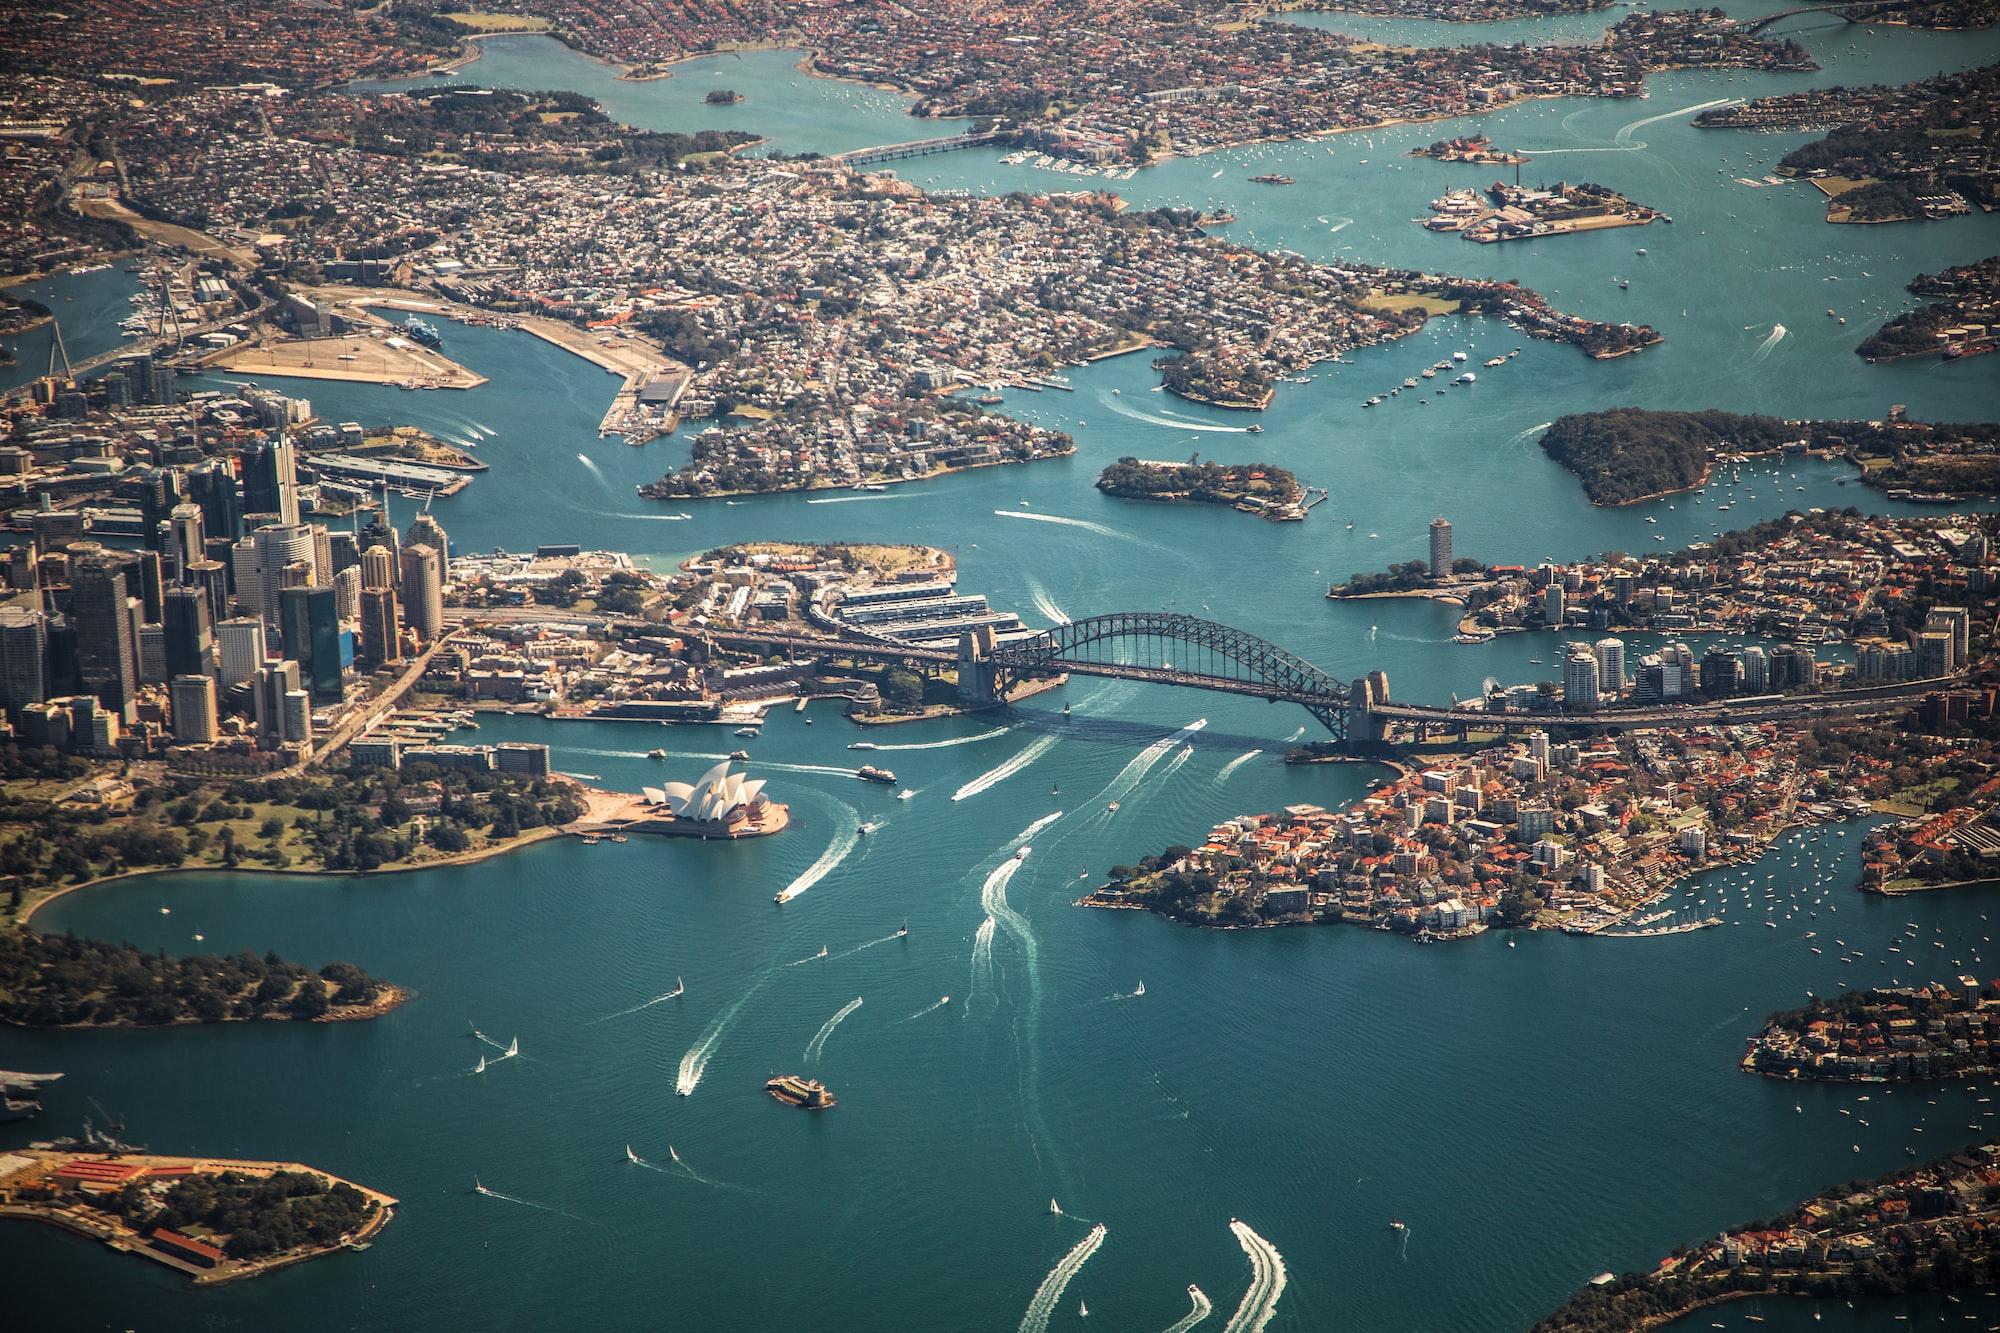 Birds Eye View of Sydney